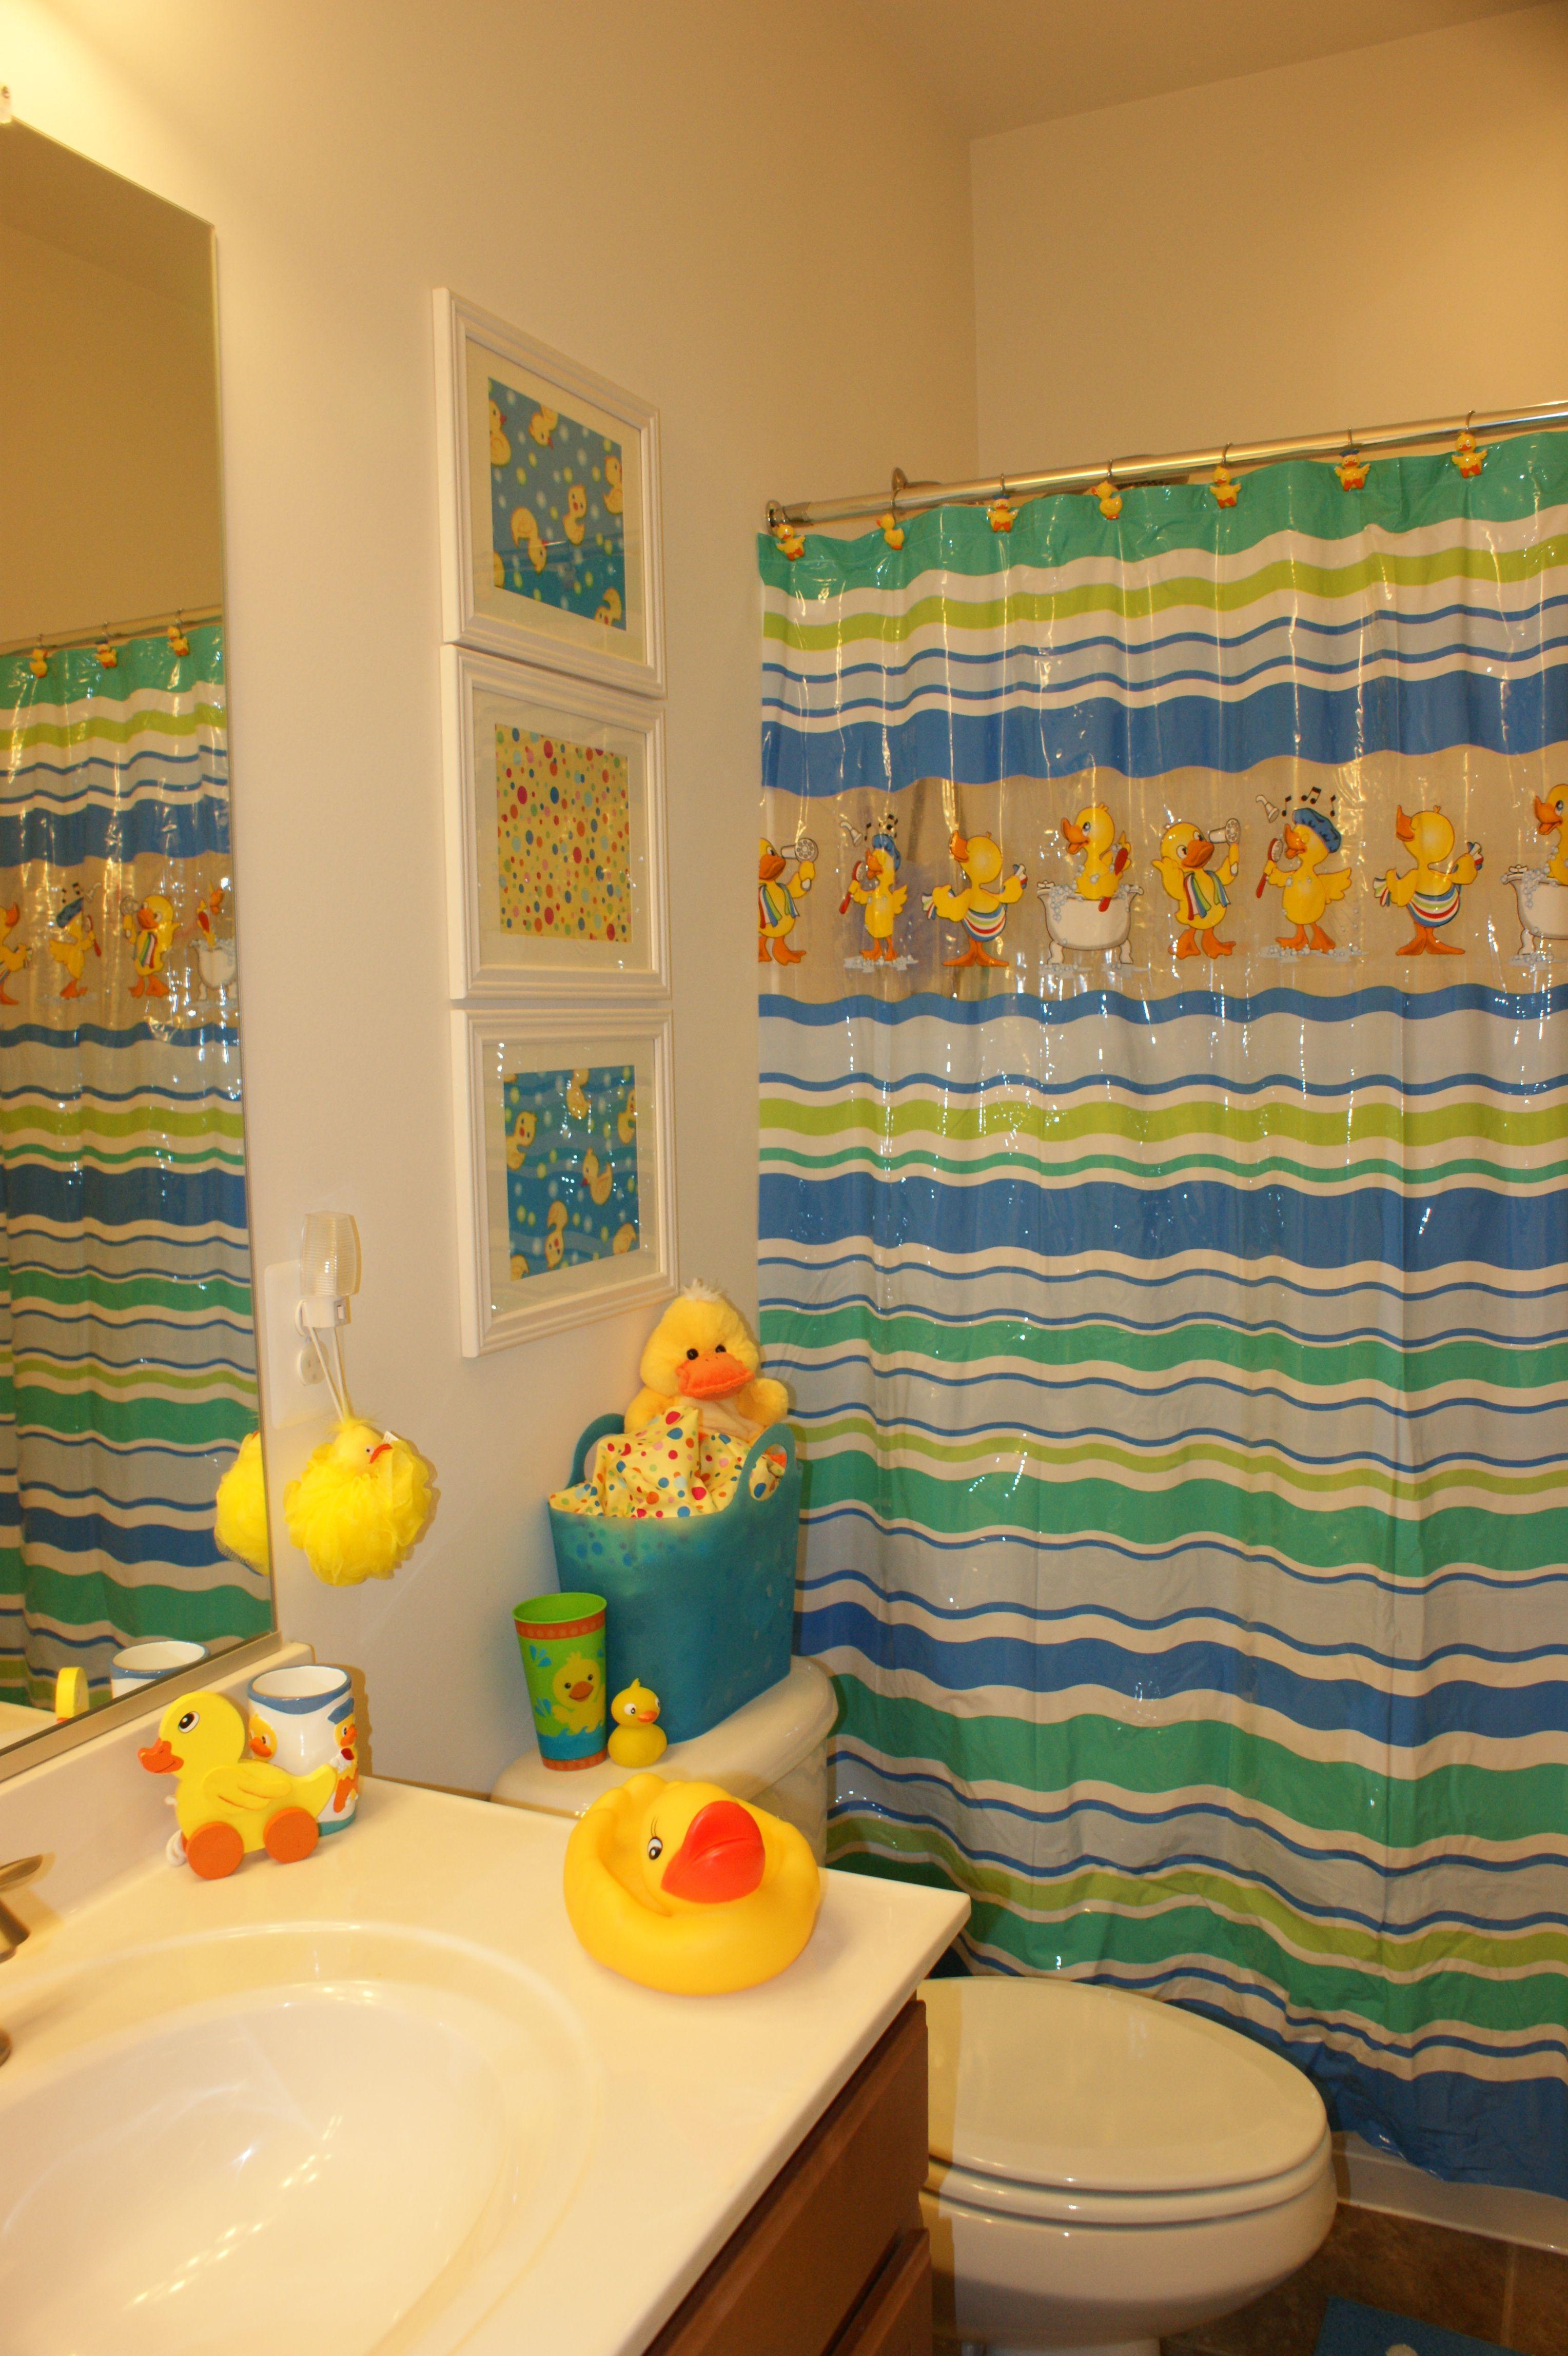 Duck Bathroom Decor For Kids Duck Bathroom Kid Bathroom Decor